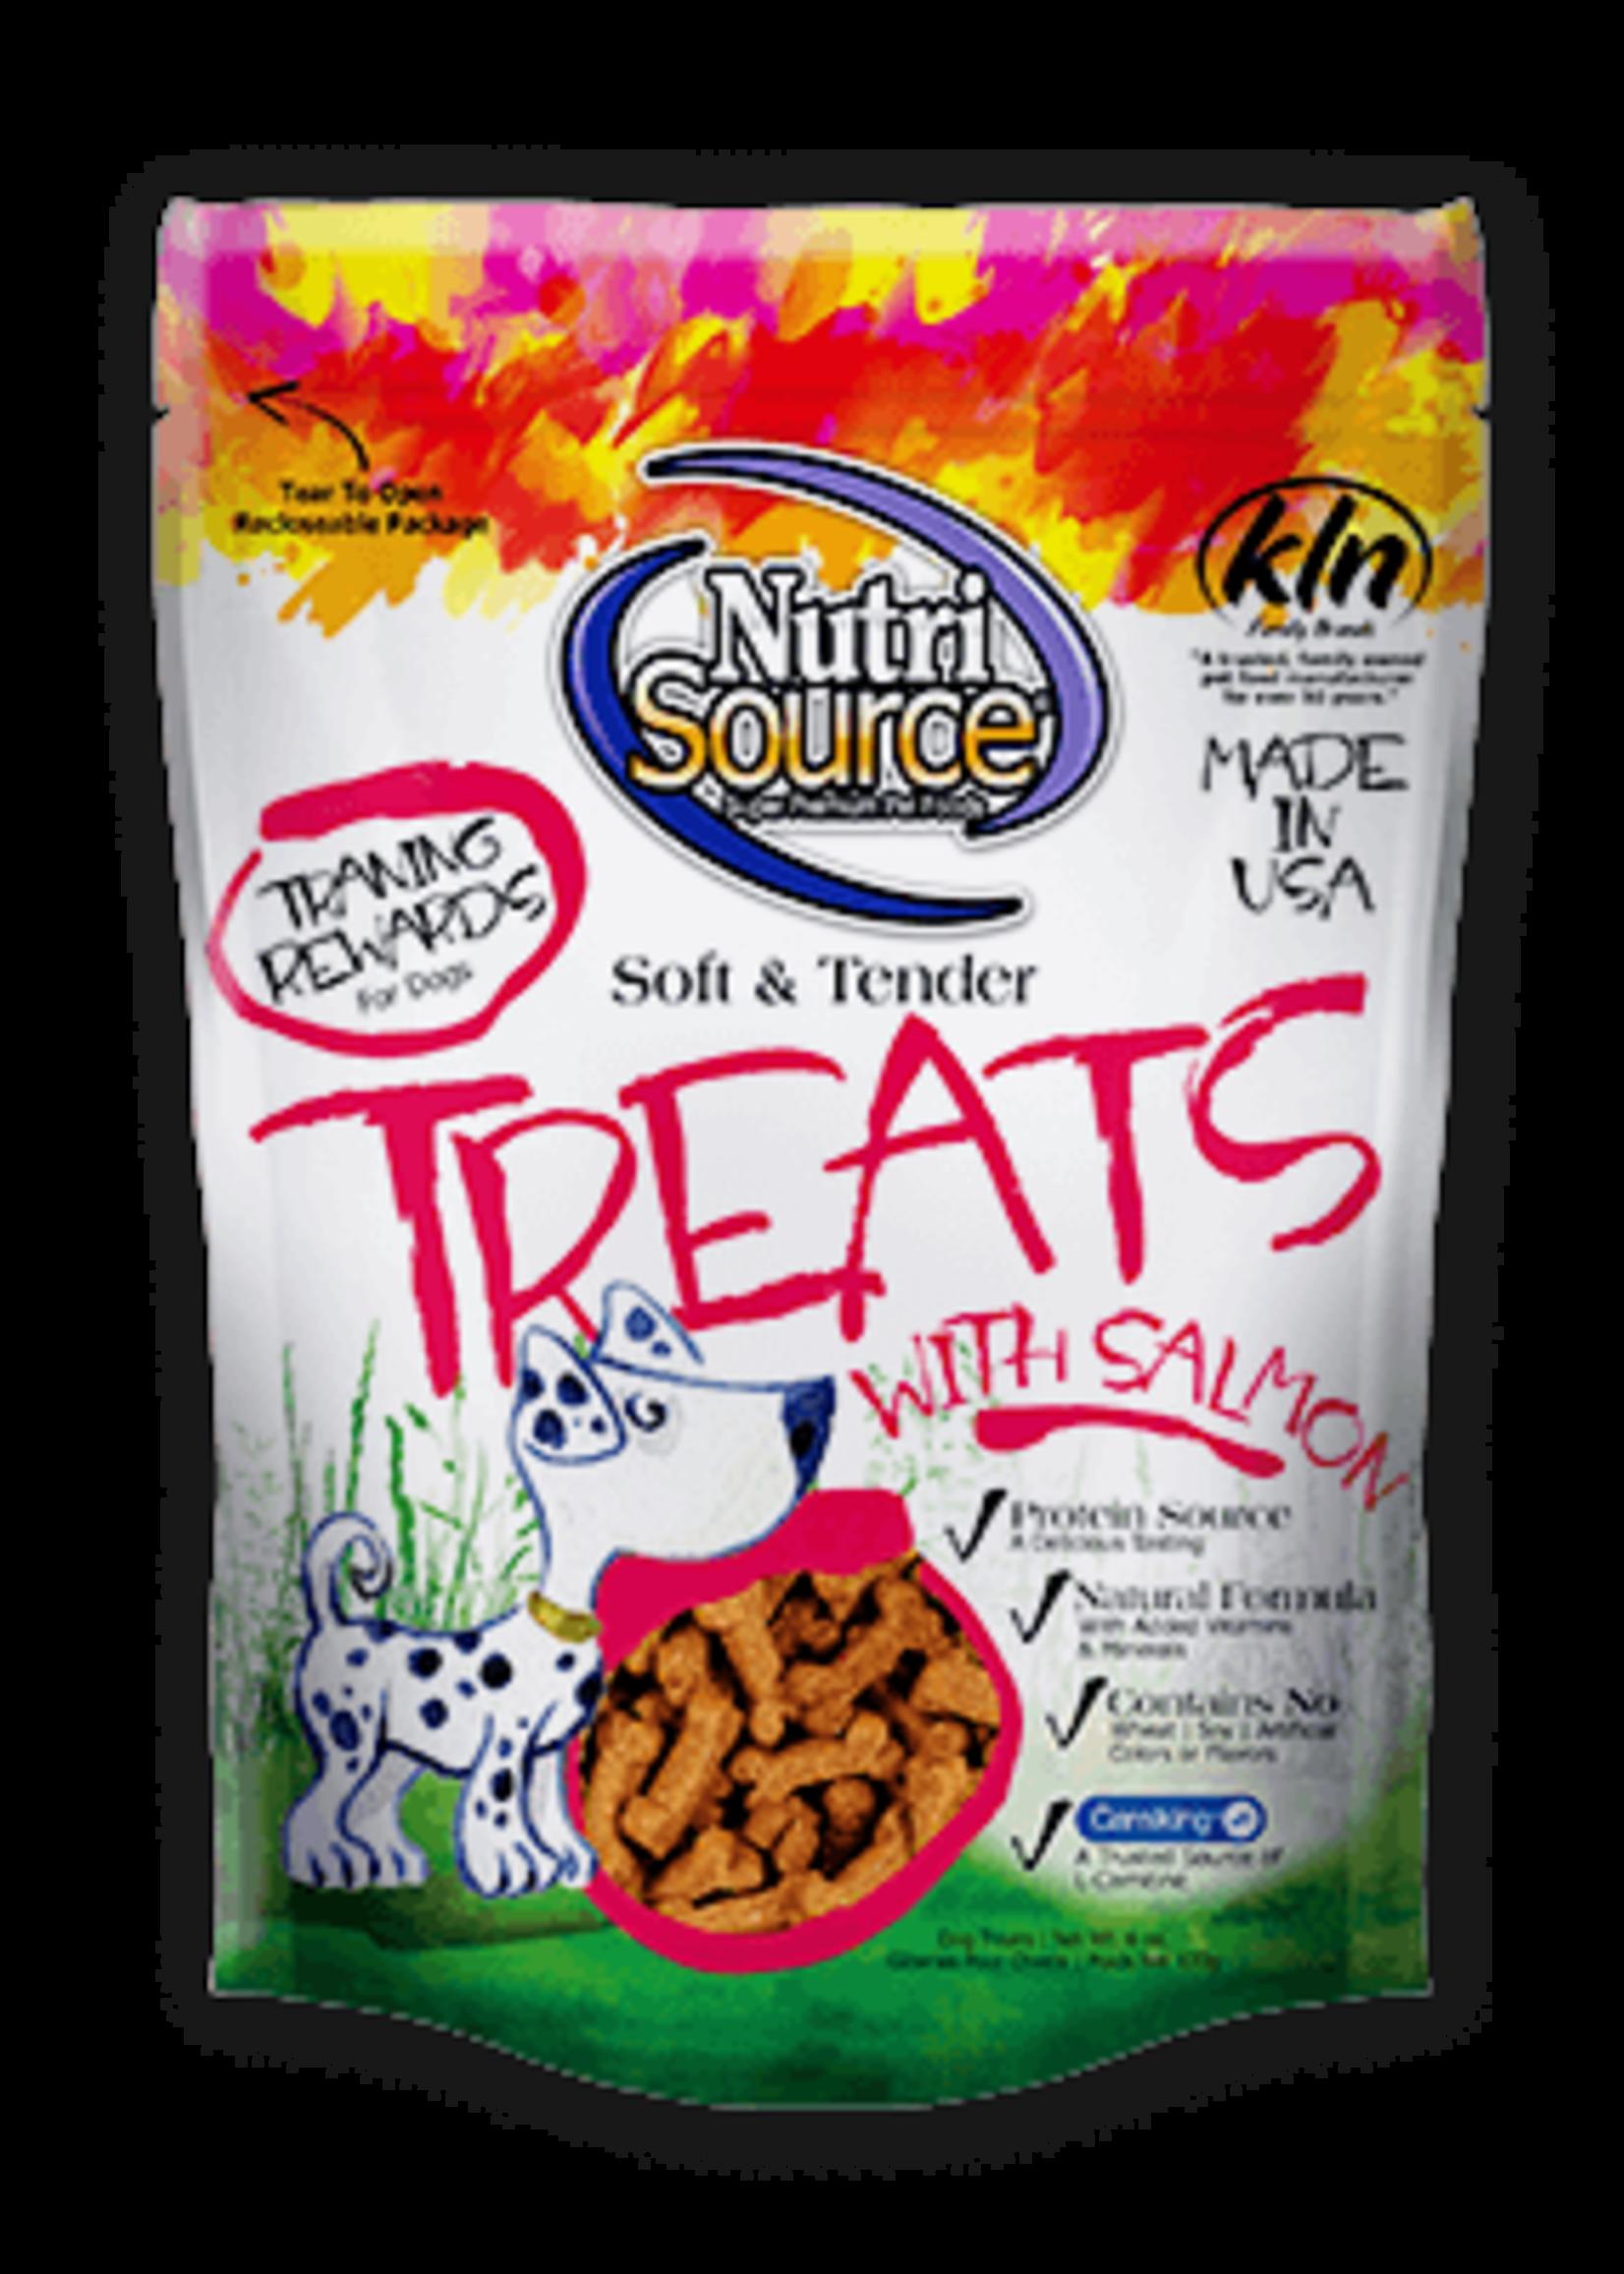 NutriSource NutriSource Dog Treat Soft and Tender Salmon 6 oz